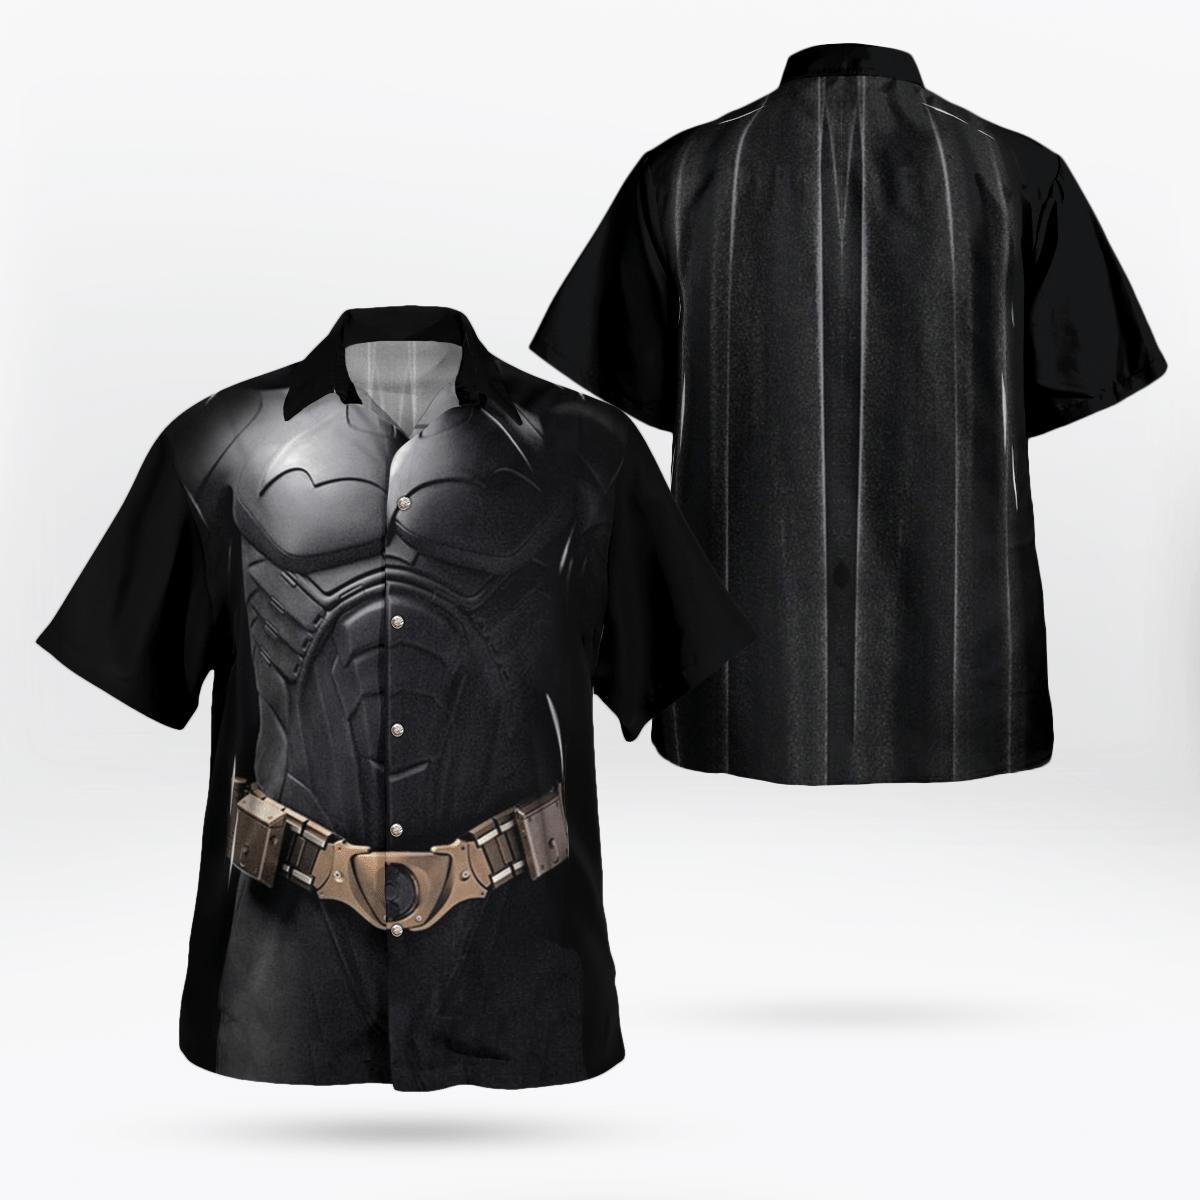 Batman Uniform 21 Century Hawaiian Shirt